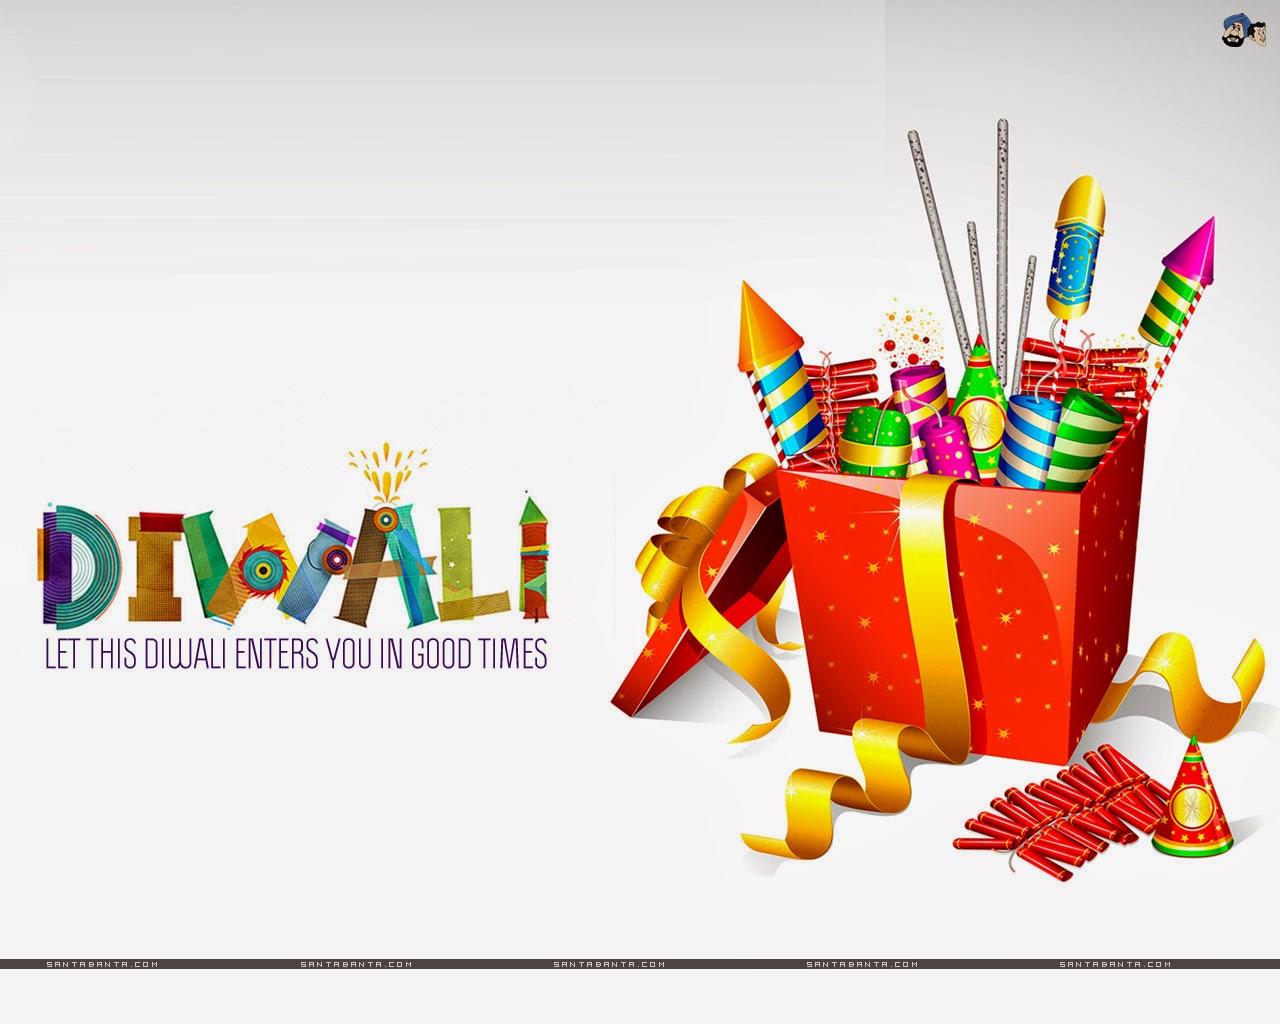 Geniusjaggus Analysis Happy Diwali Folksasons Greetings